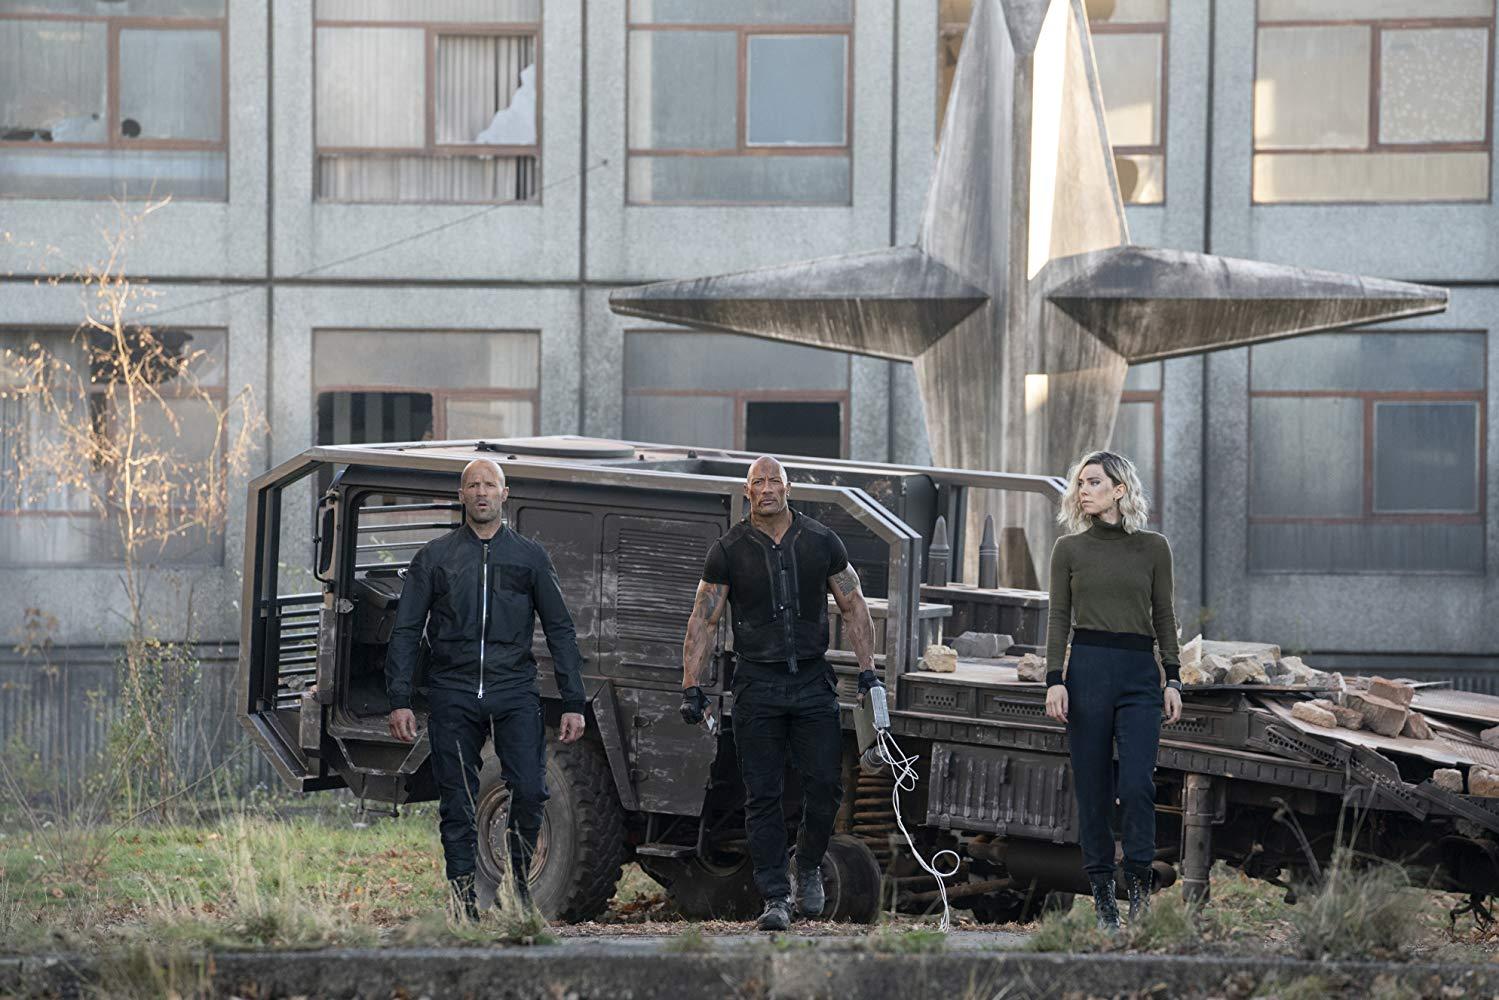 Jason Statham, Dwayne Johnson, Vanessa Kirby en Hobbs y Shaw (Crítica de la película)